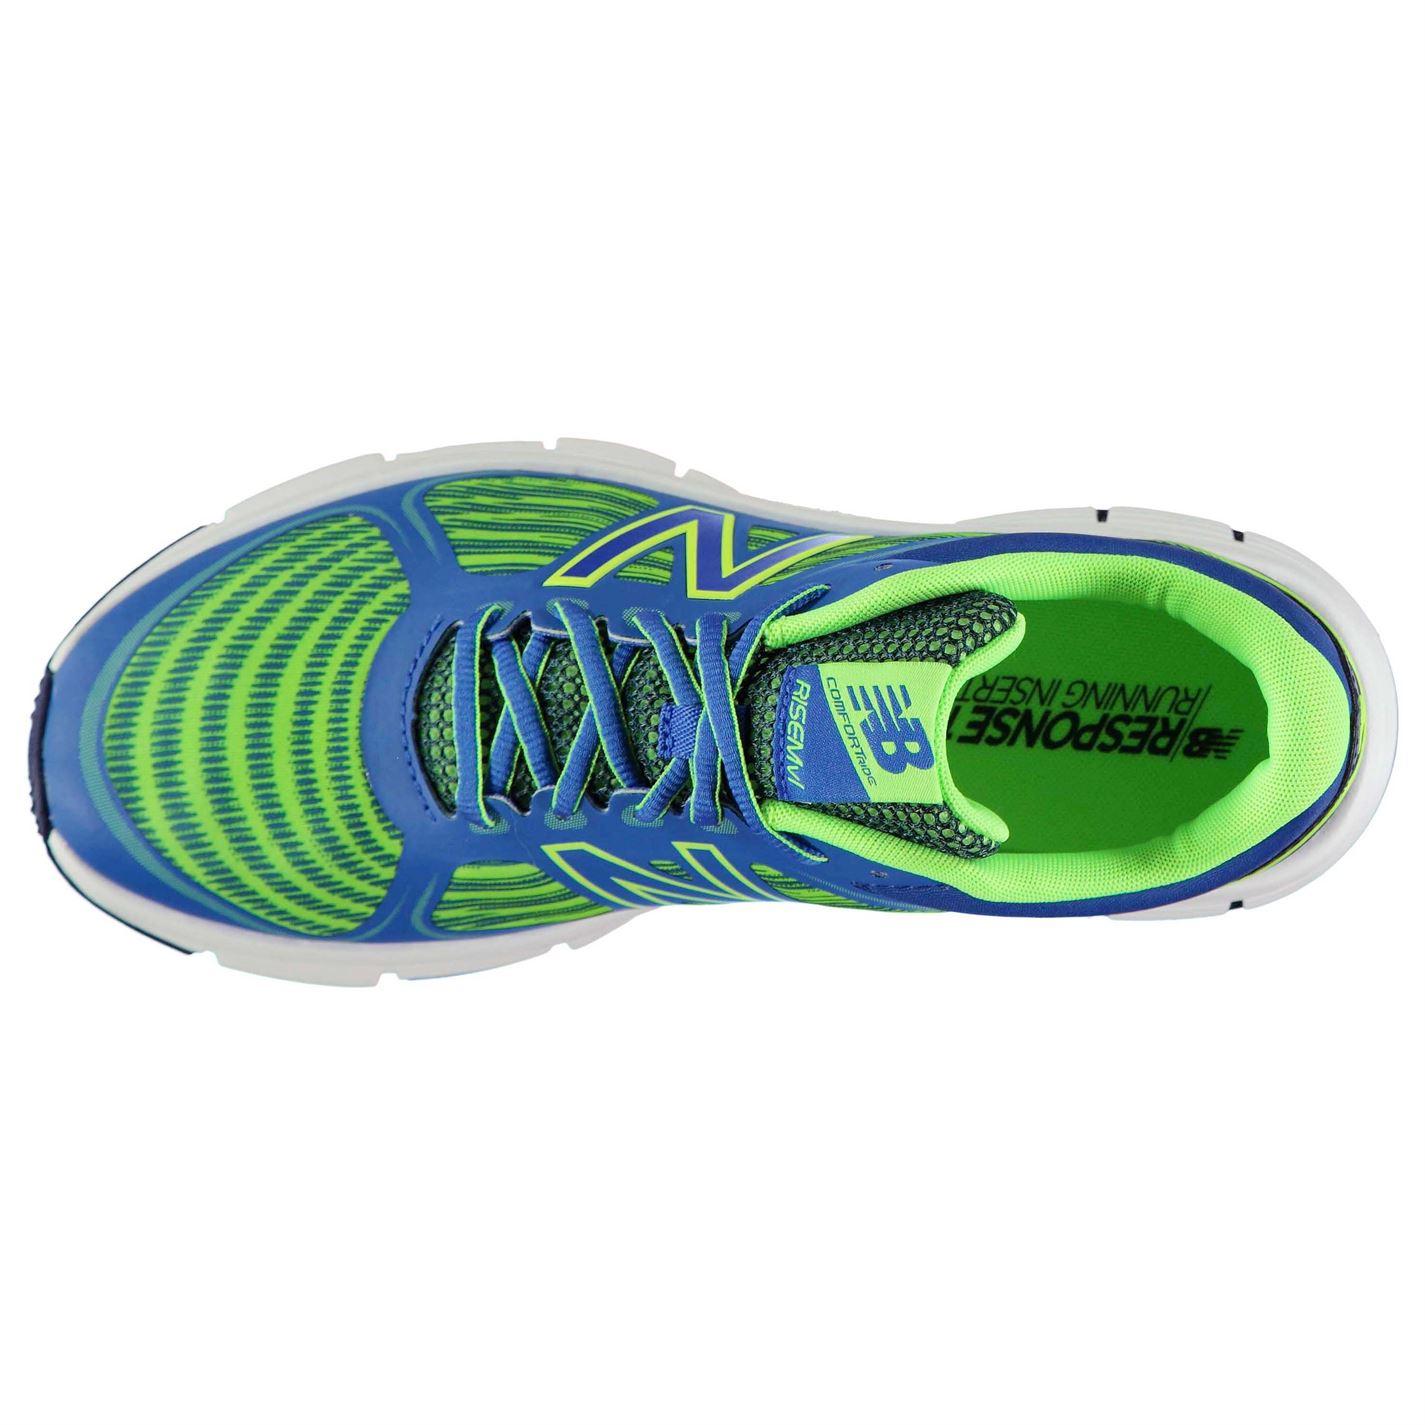 Tenis-New-Balance-RIFM-v1-para-hombre-Caballeros-De-Carretera-Zapatillas-Cordones-atados miniatura 10